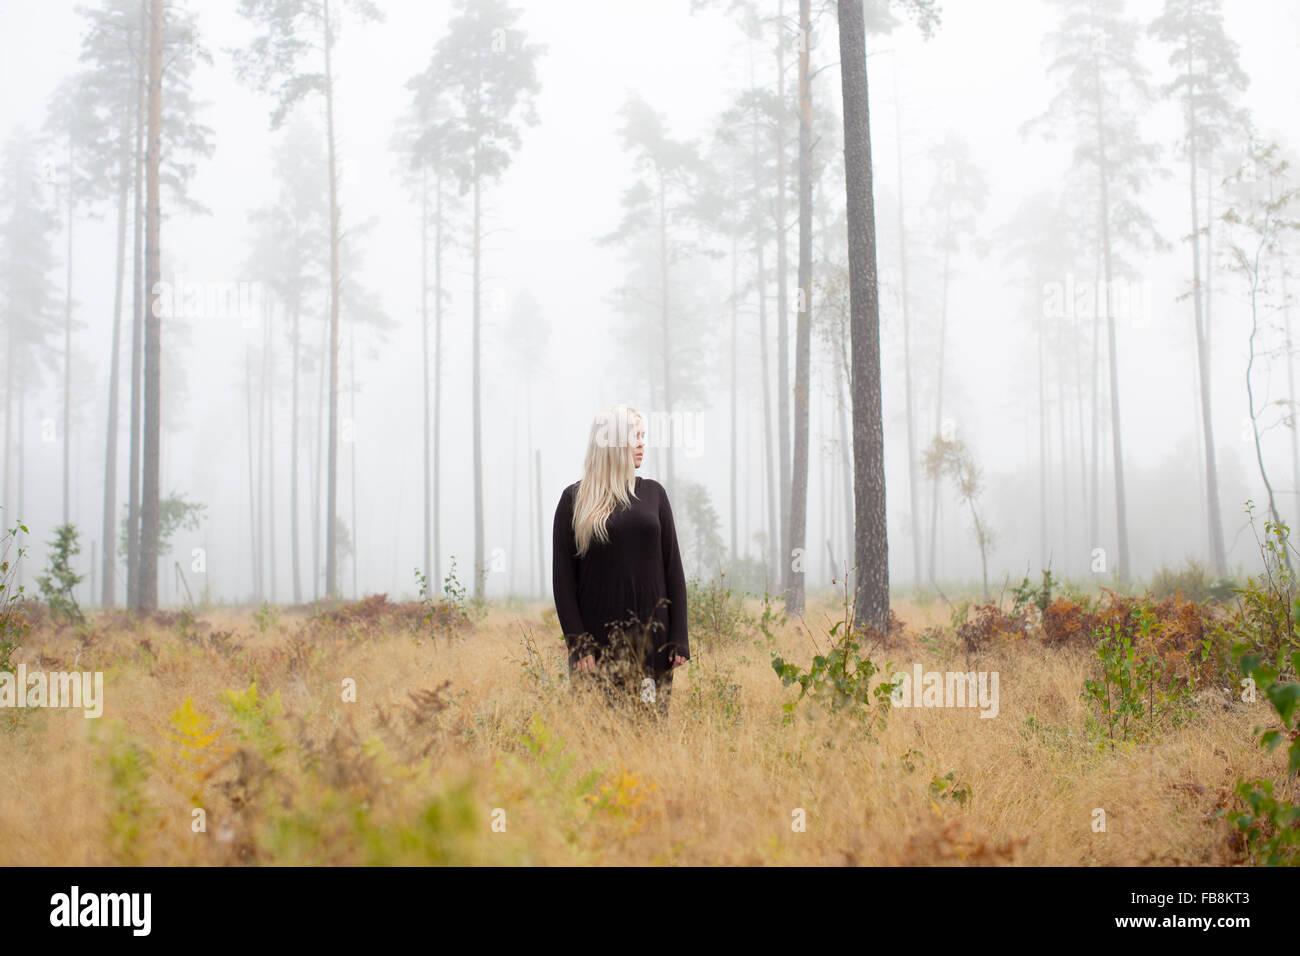 Sweden, Ostergotland, Woman in fog - Stock Image